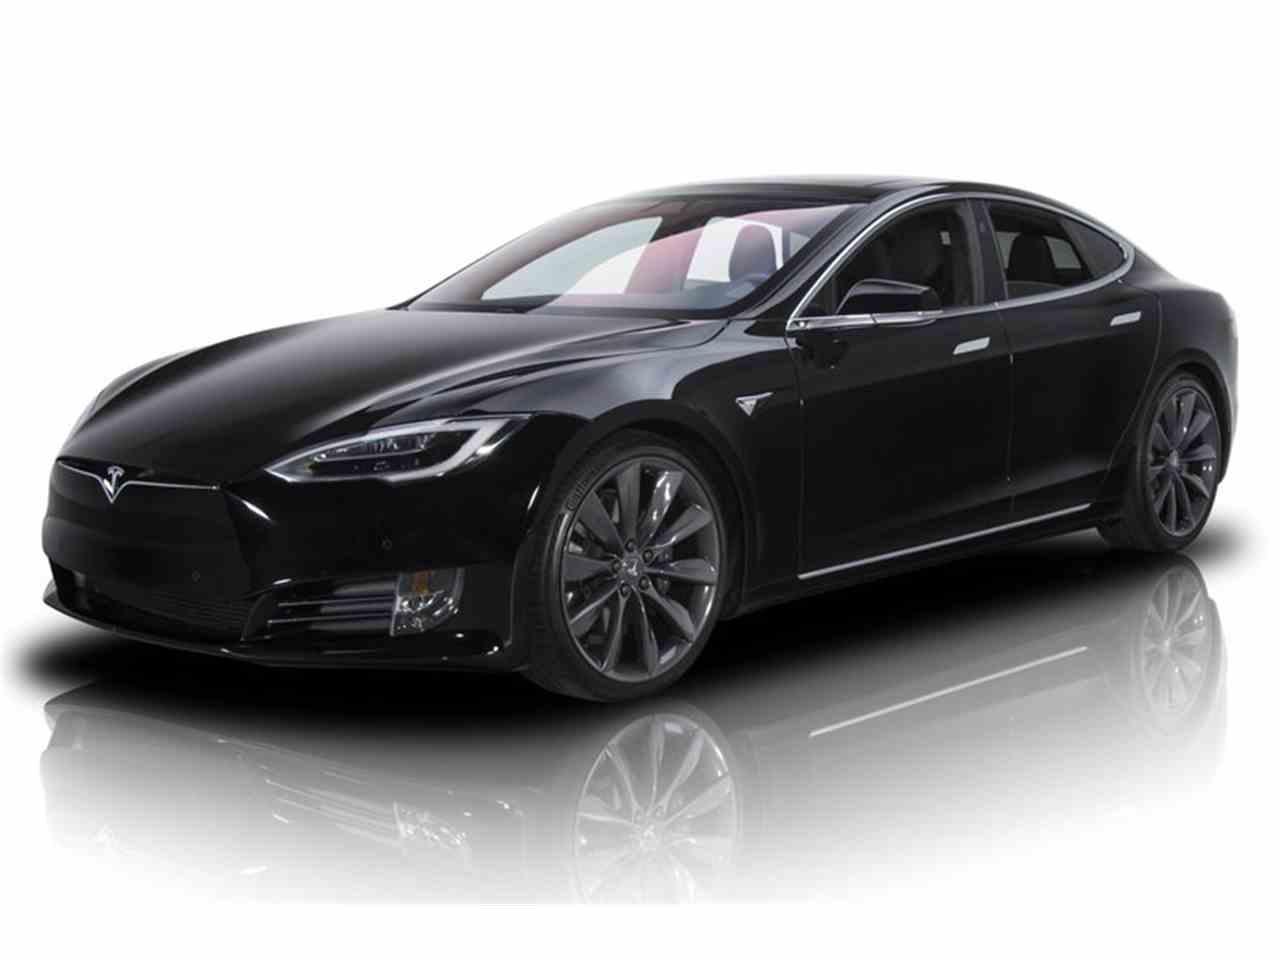 2017 Tesla Model S for Sale - CC-1046634